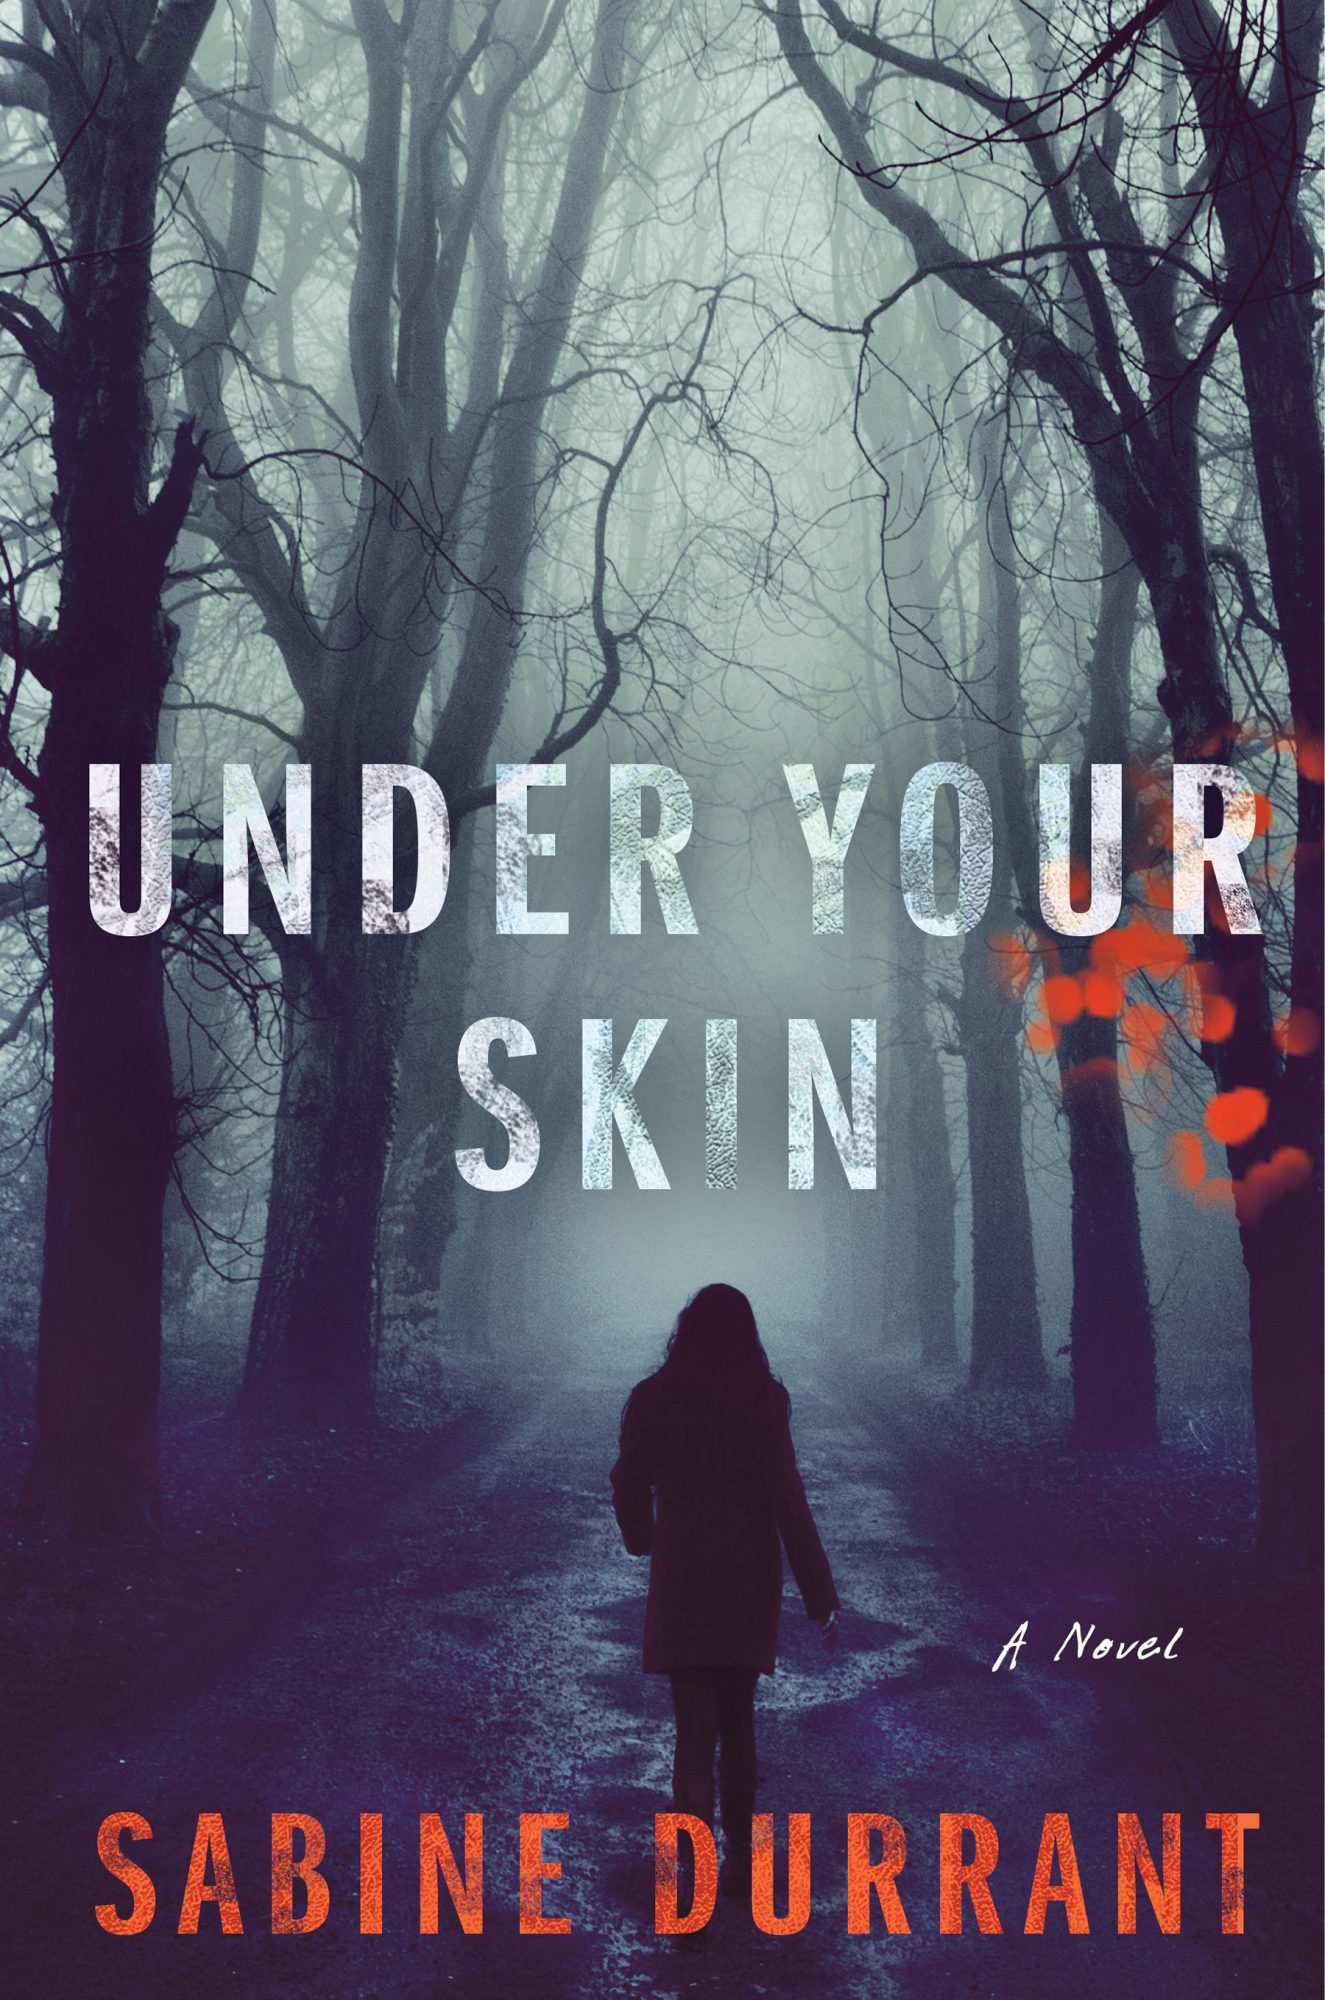 Under Your Skin (2/4/14)by Sabine Durrant